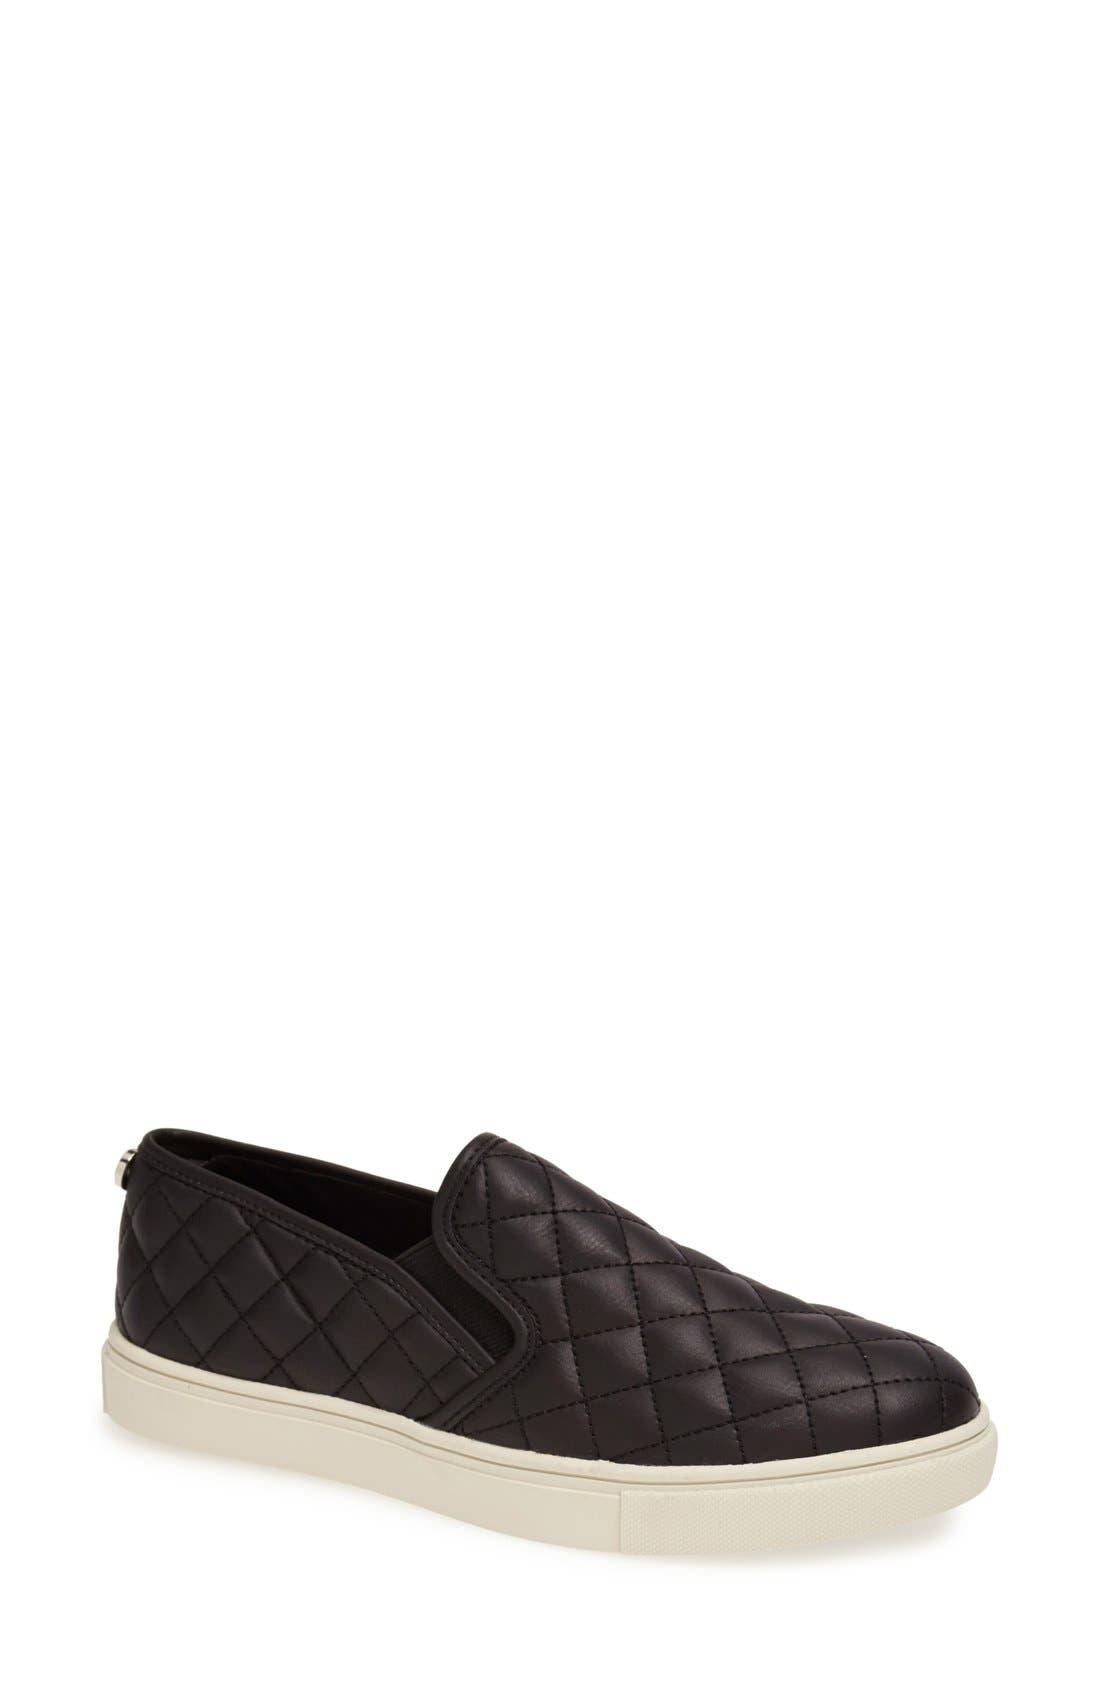 STEVE MADDEN Ecentrcq Sneaker, Main, color, BLACK FAUX LEATHER